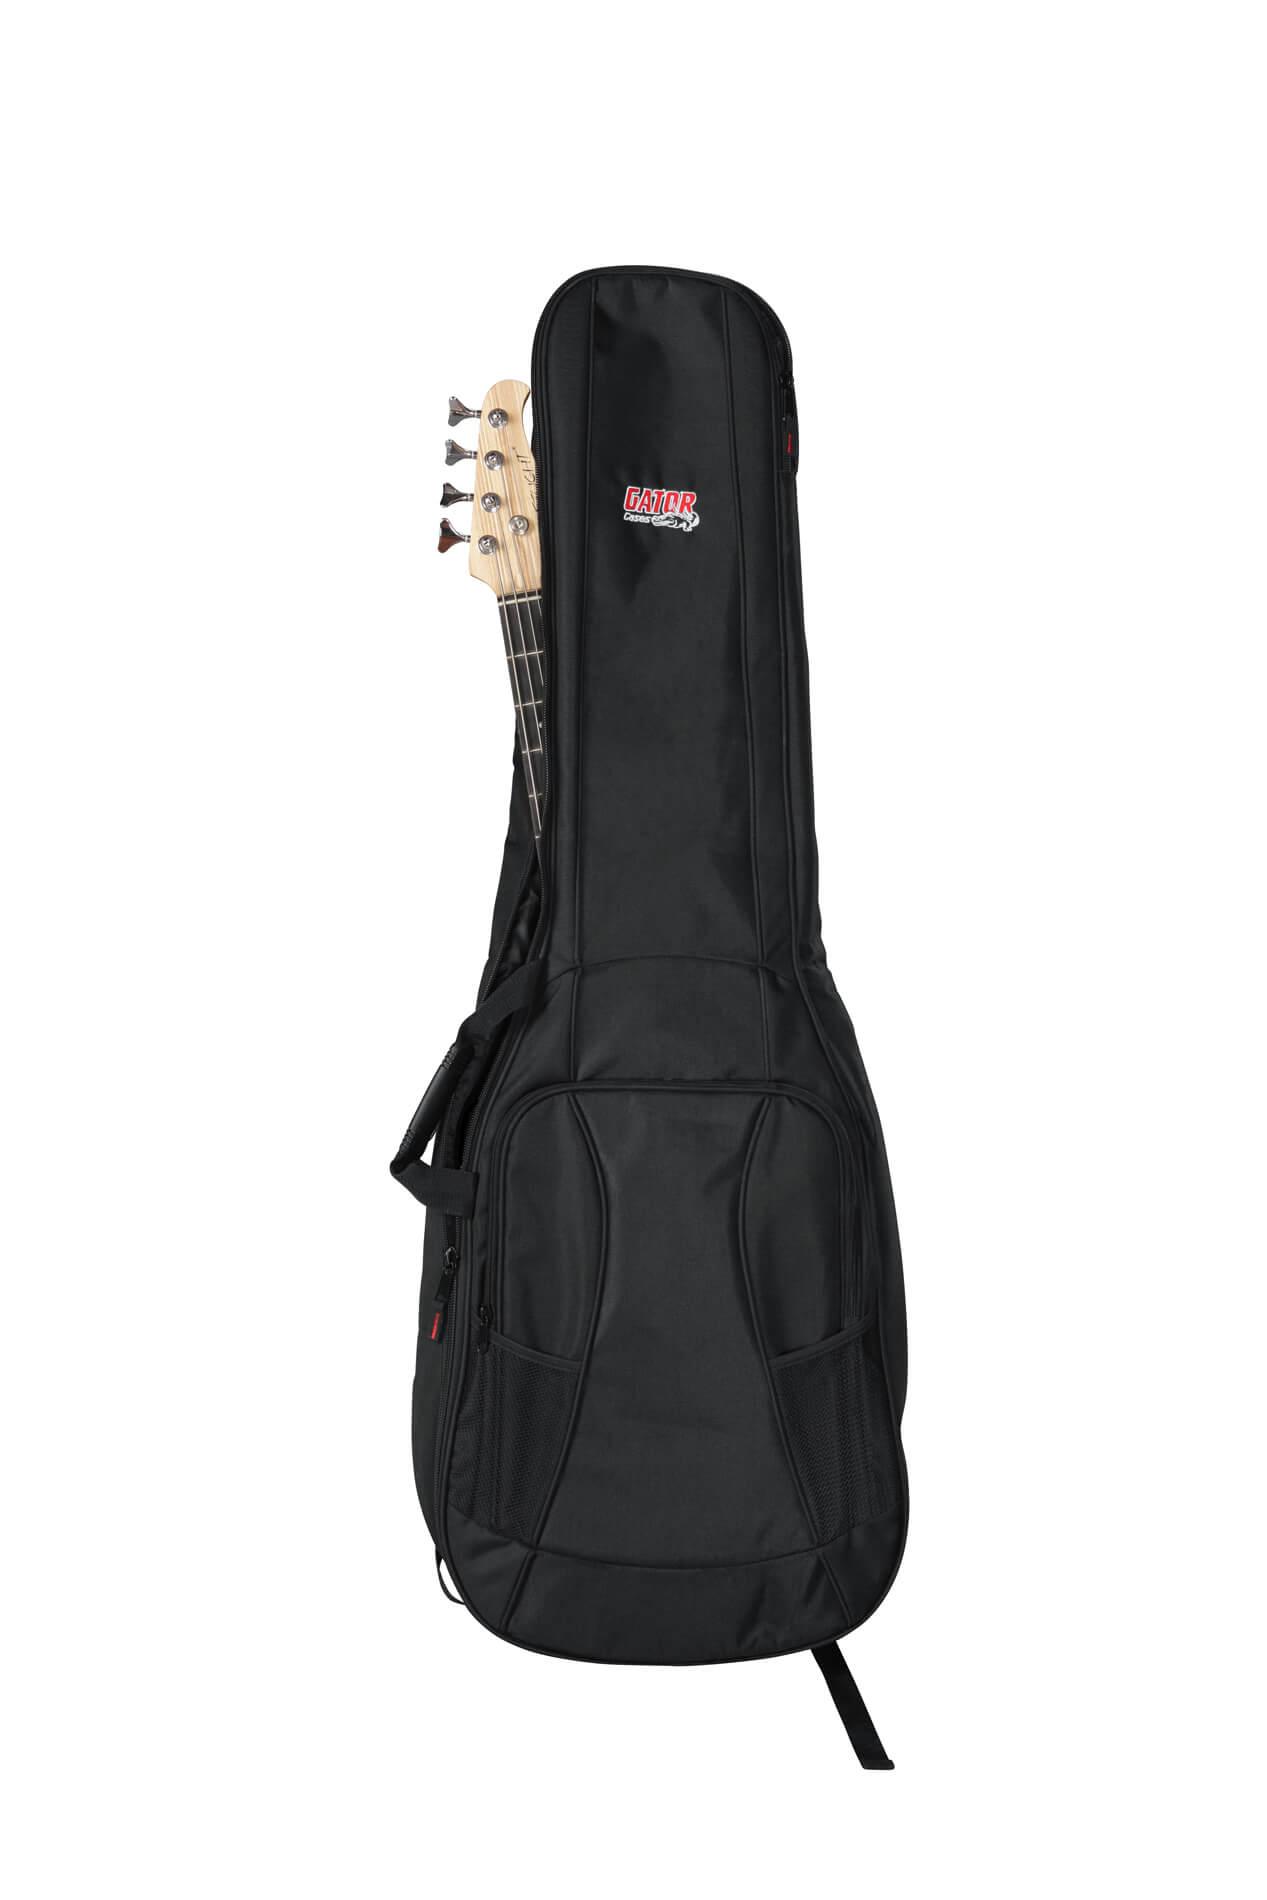 hight resolution of dual bass guitar gig bag gb 4g bassx2 gator cases